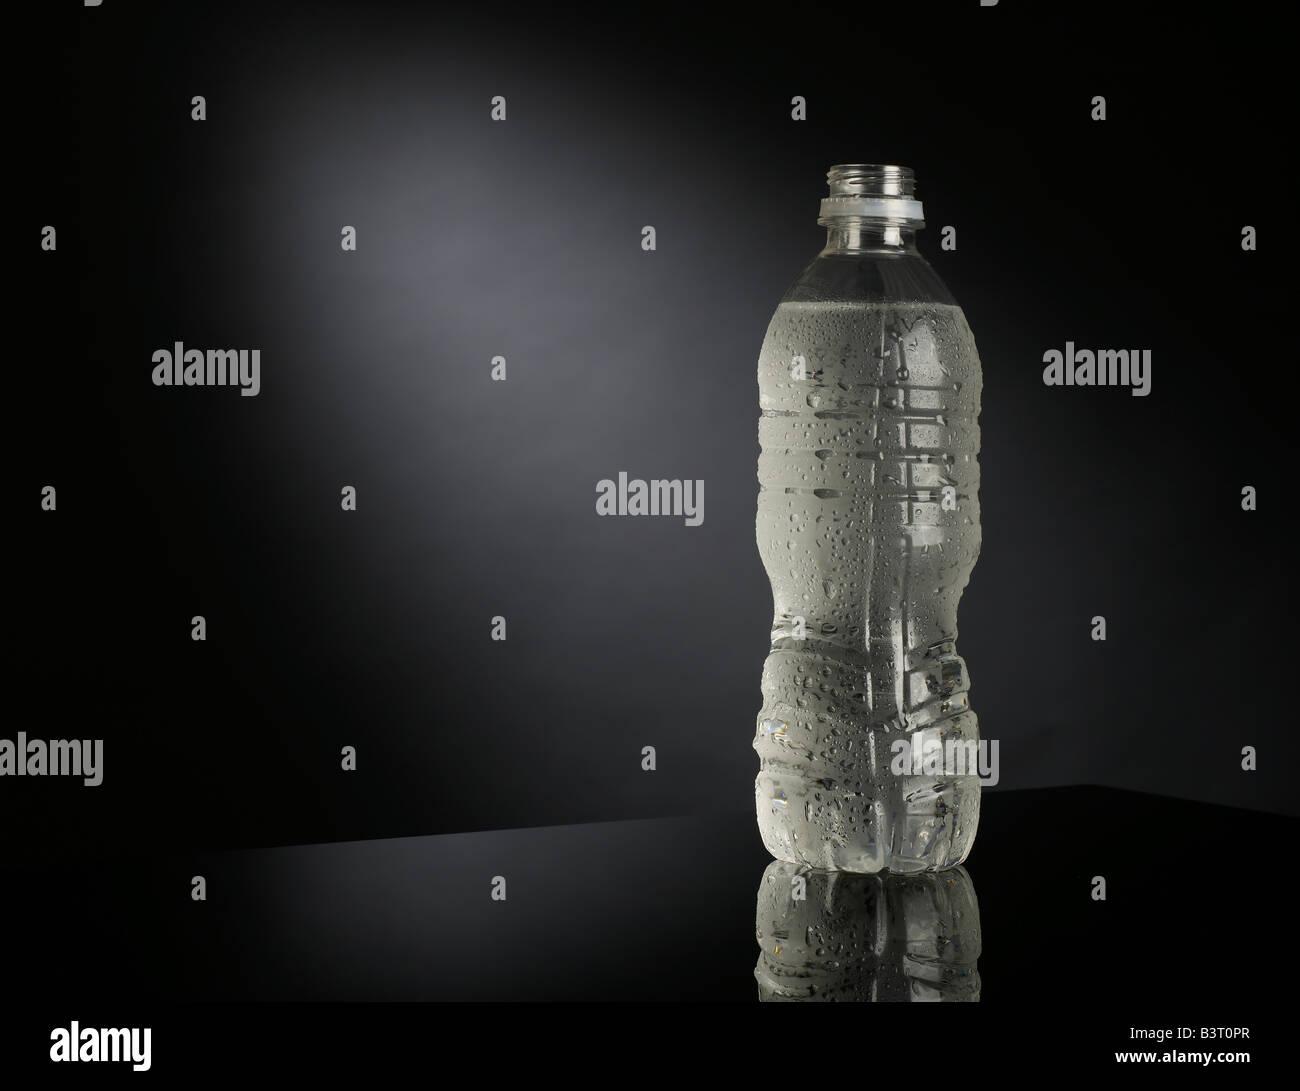 Bottle of water horizontal - Stock Image